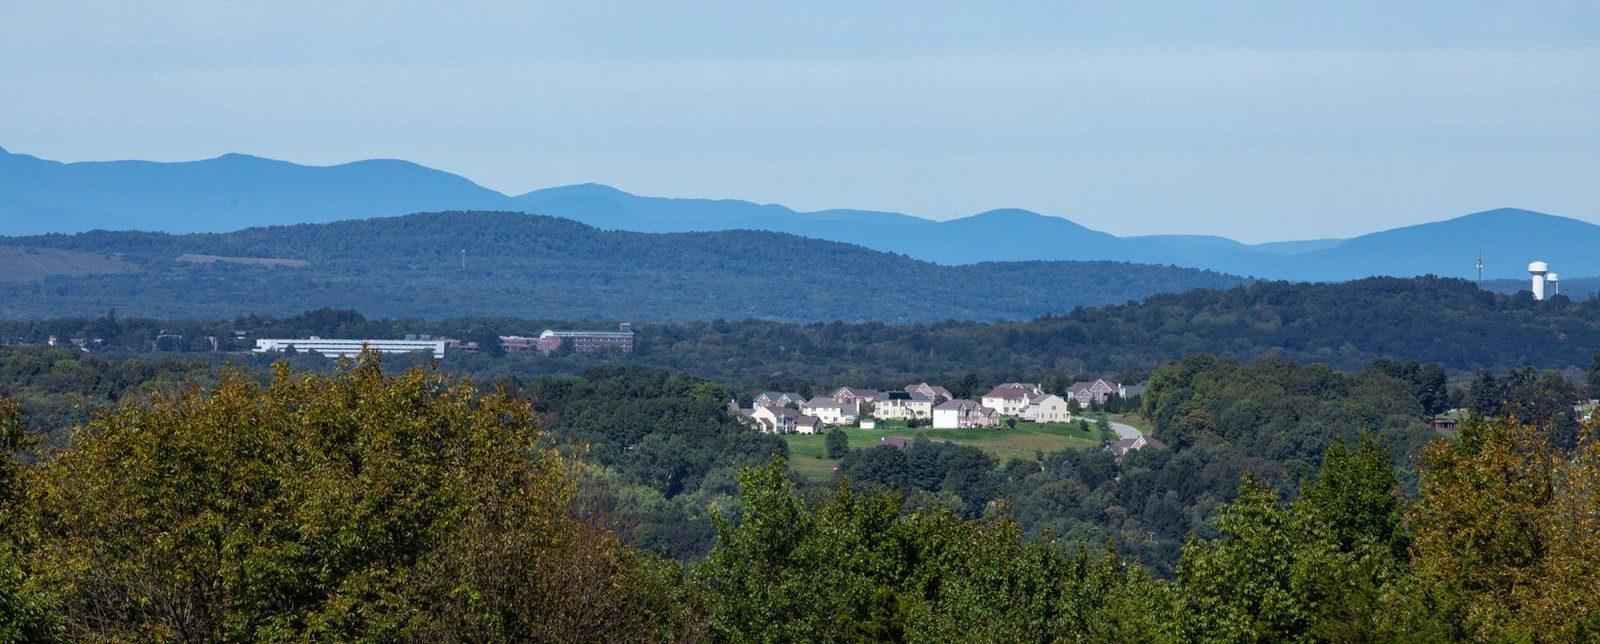 'Sleight Farm at LaGrange' by Sleight Farm at LaGrange in Dutchess County